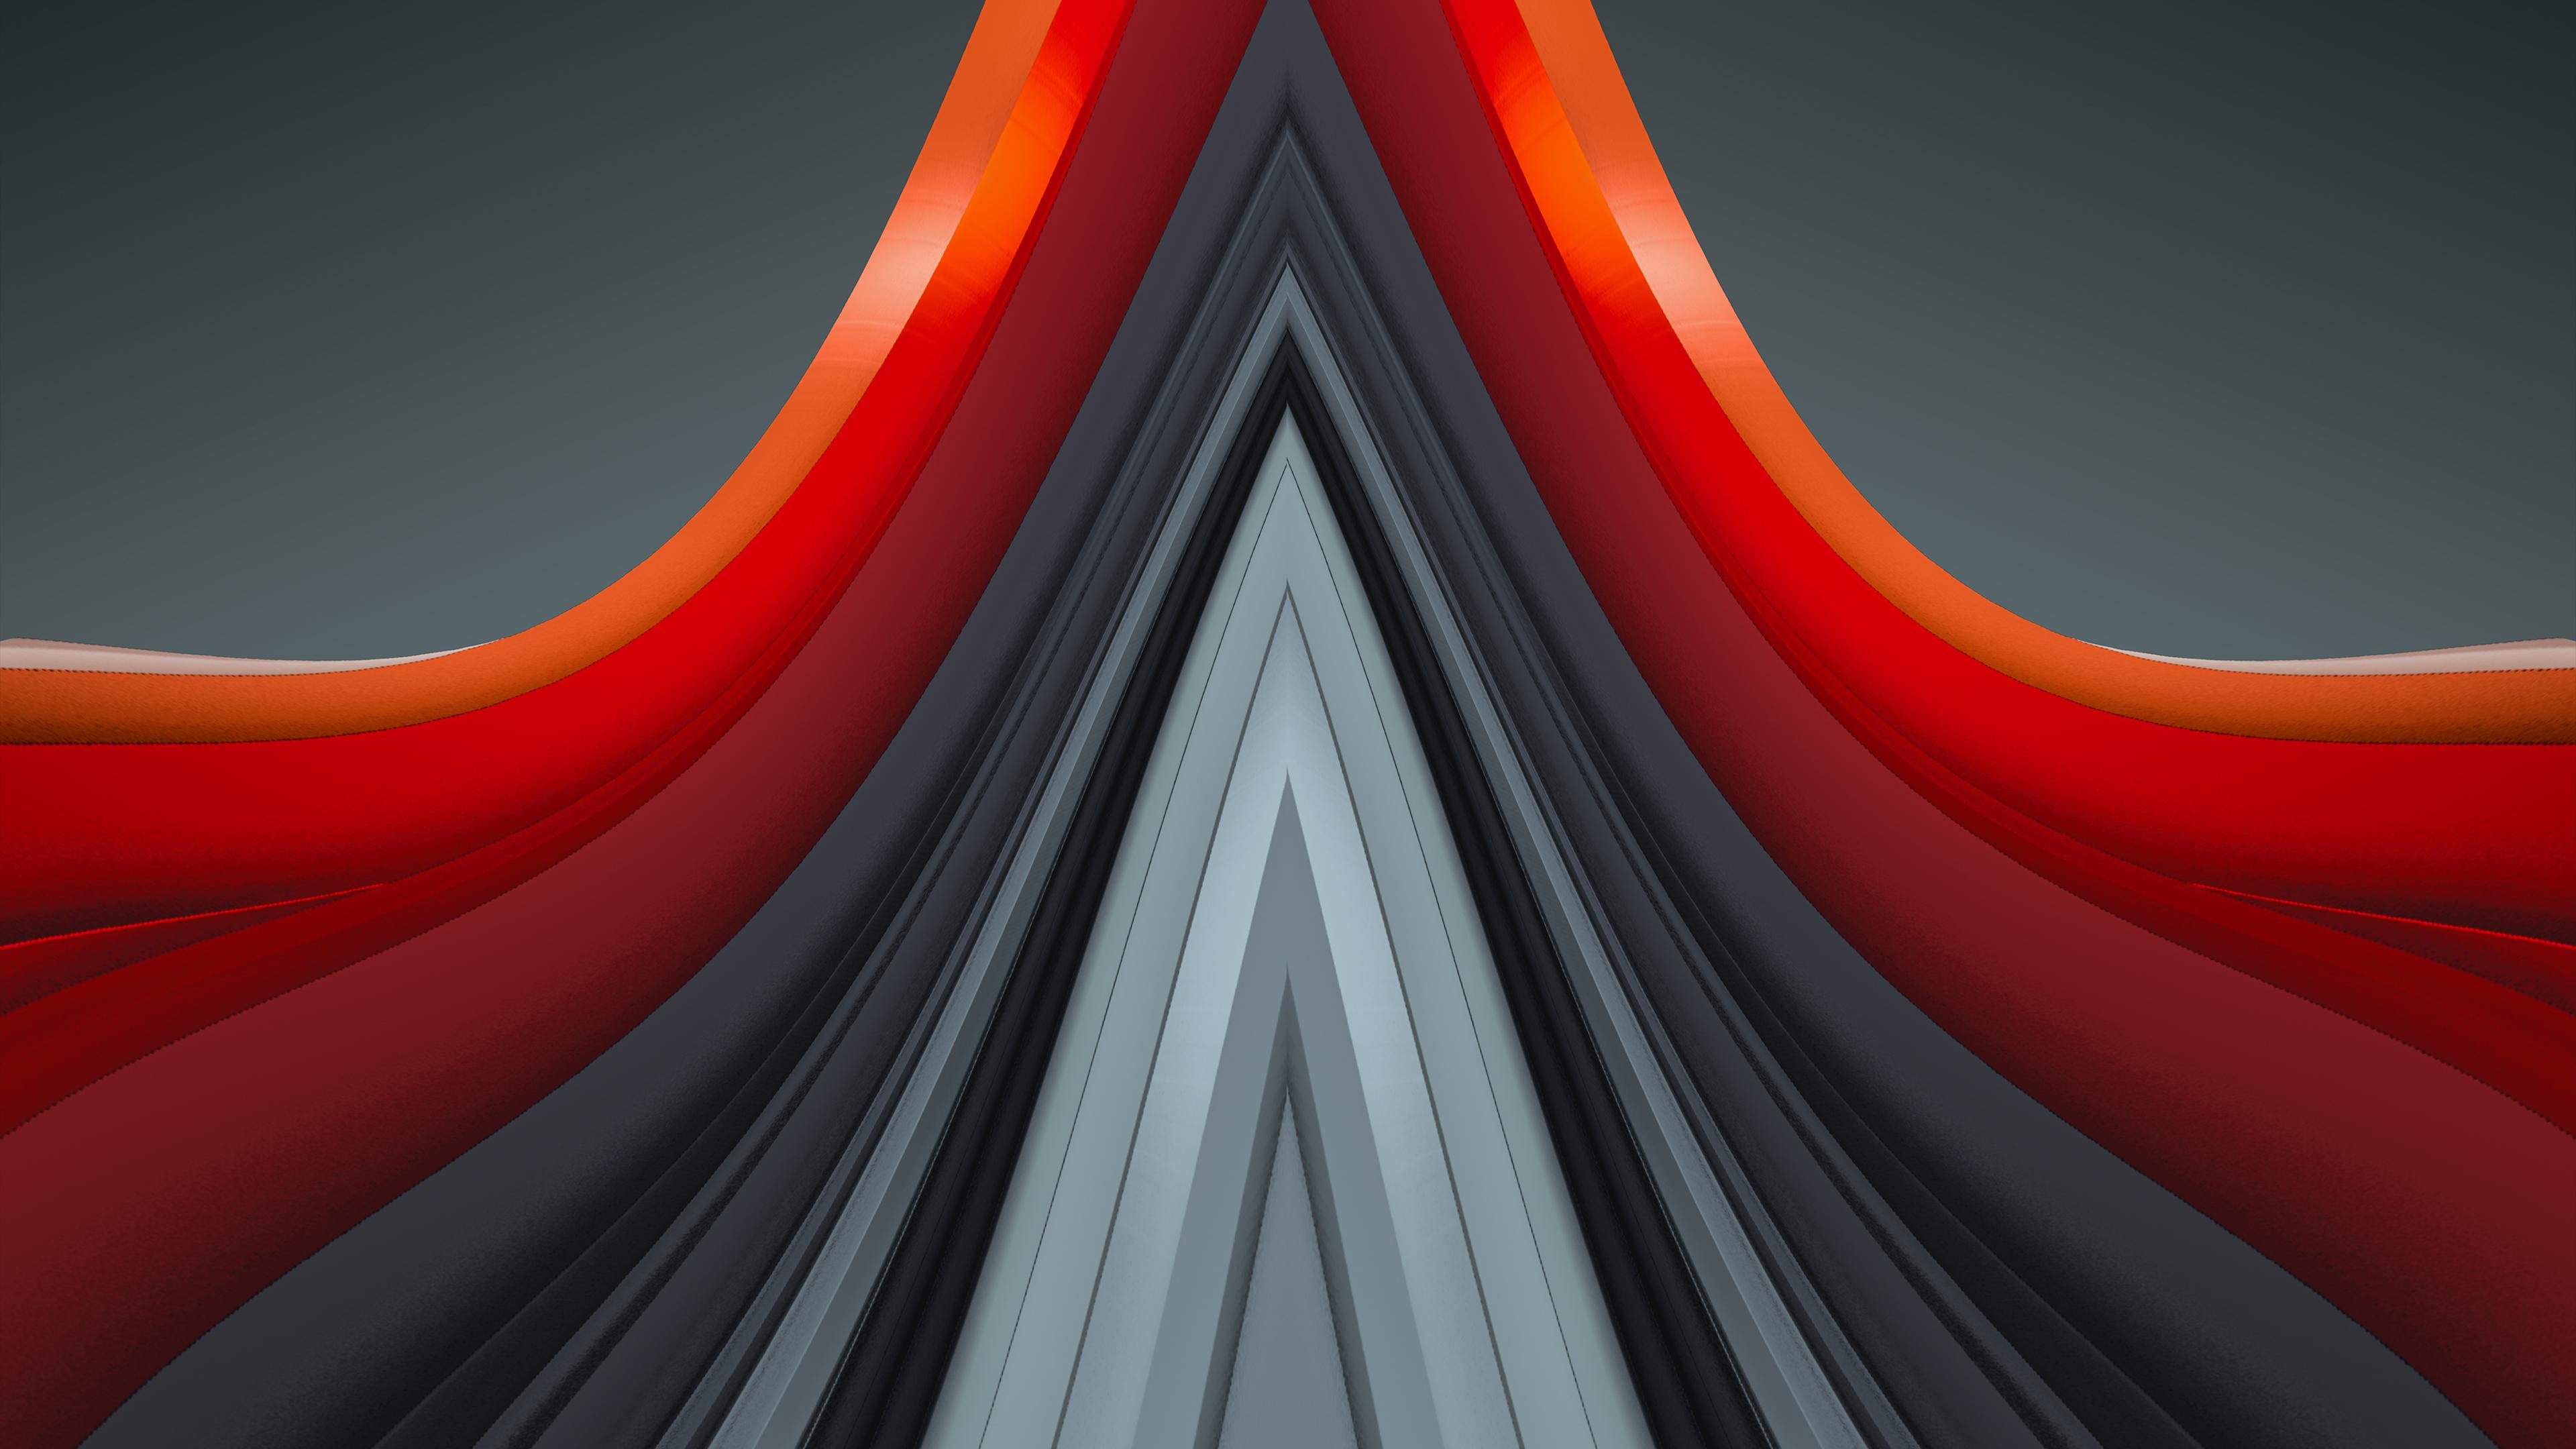 3d-triangle-4k-i5.jpg